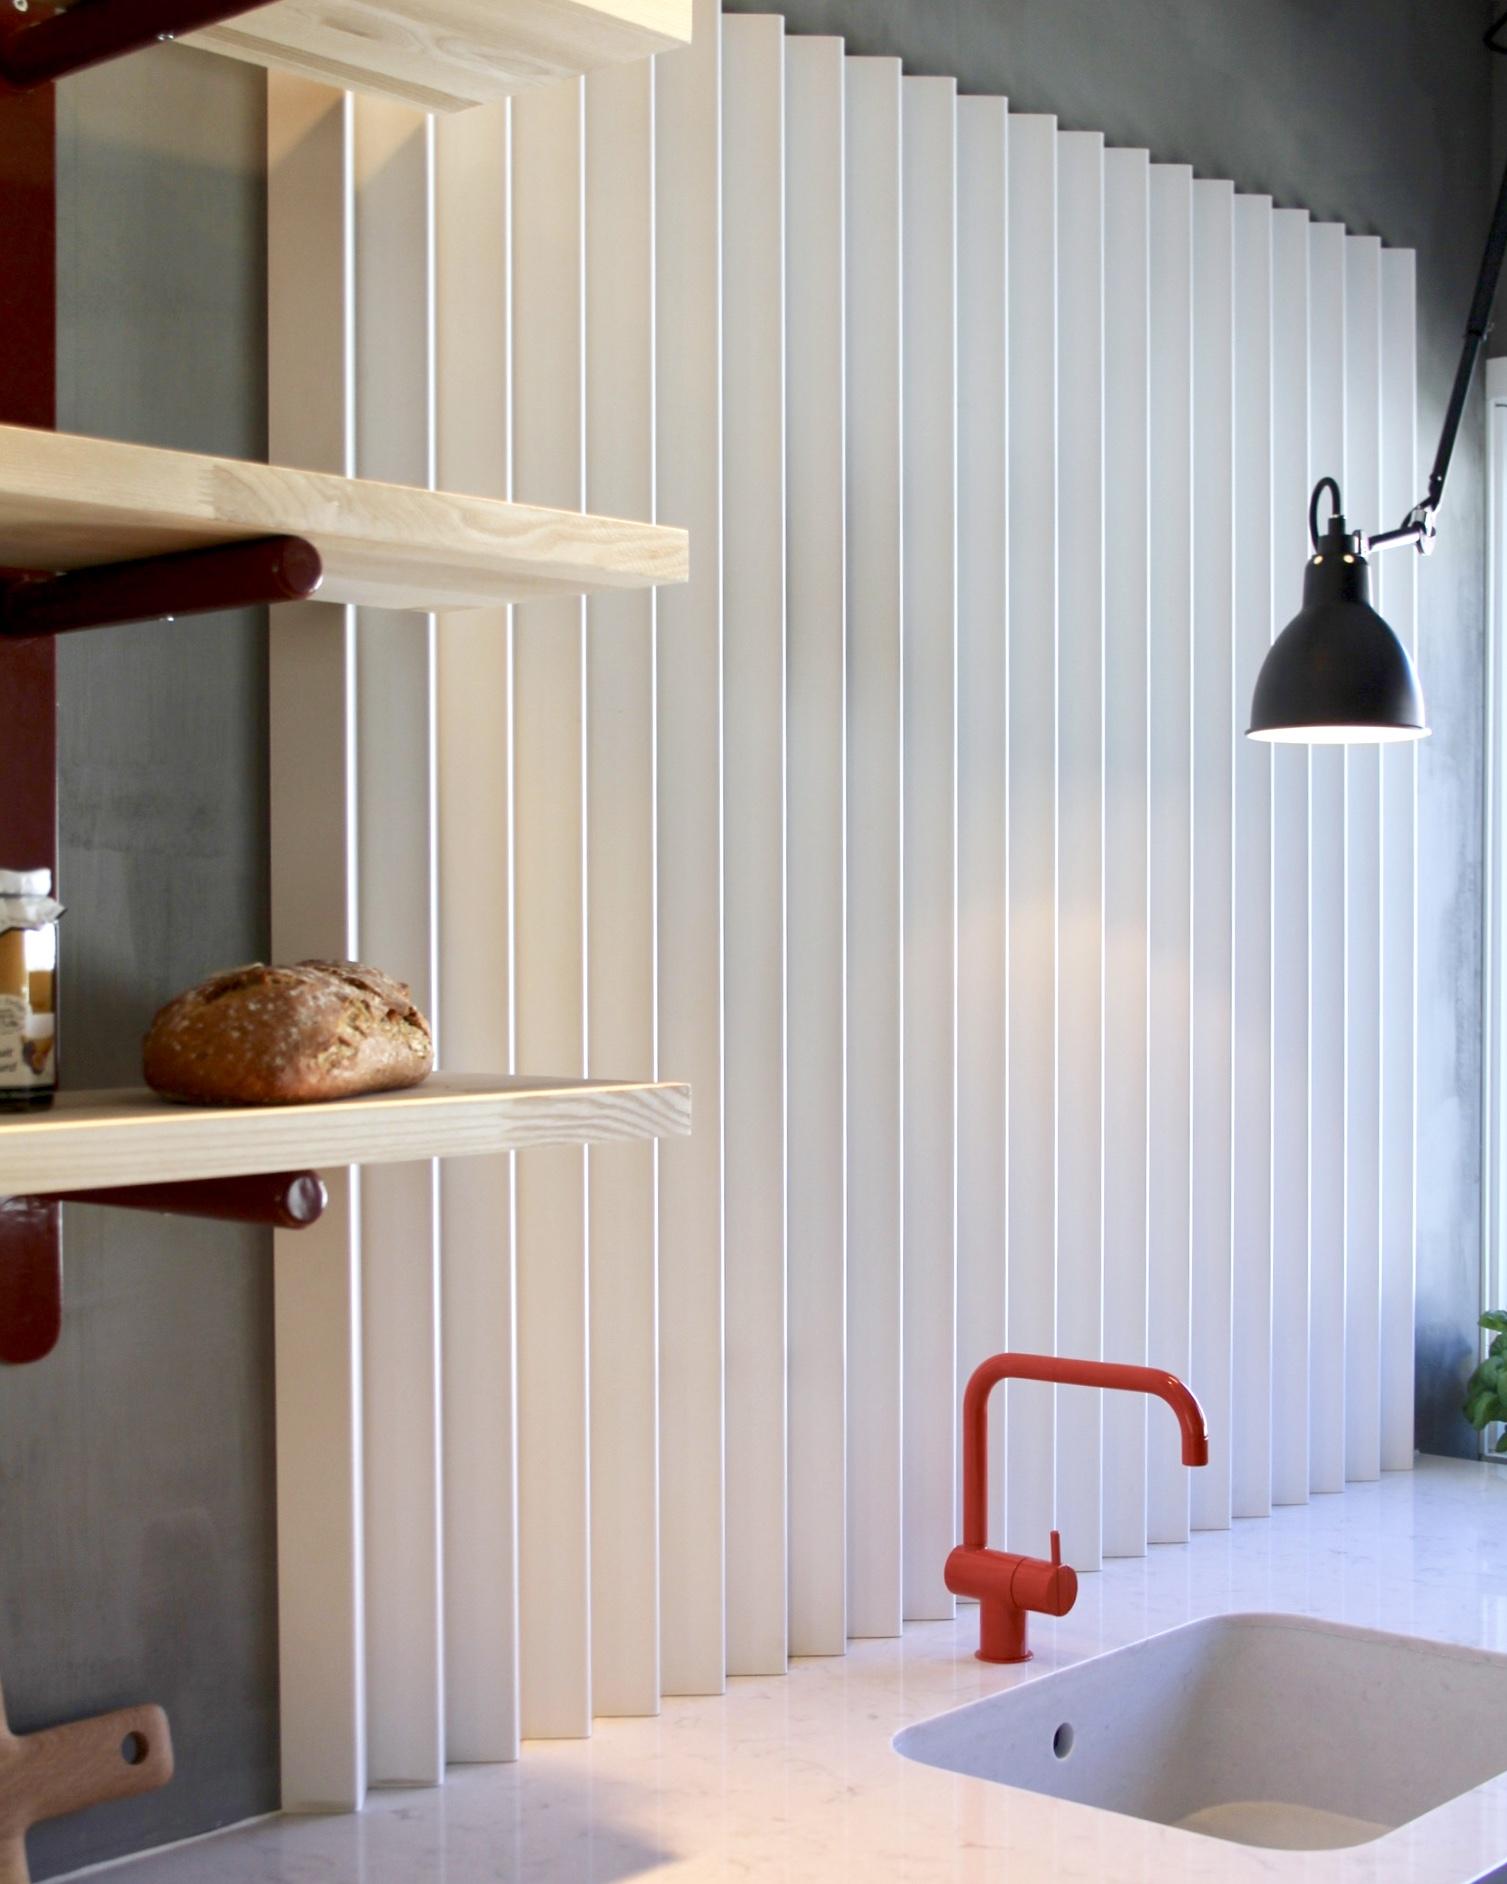 Bespoke shelves with a custom made folded metal splashback.